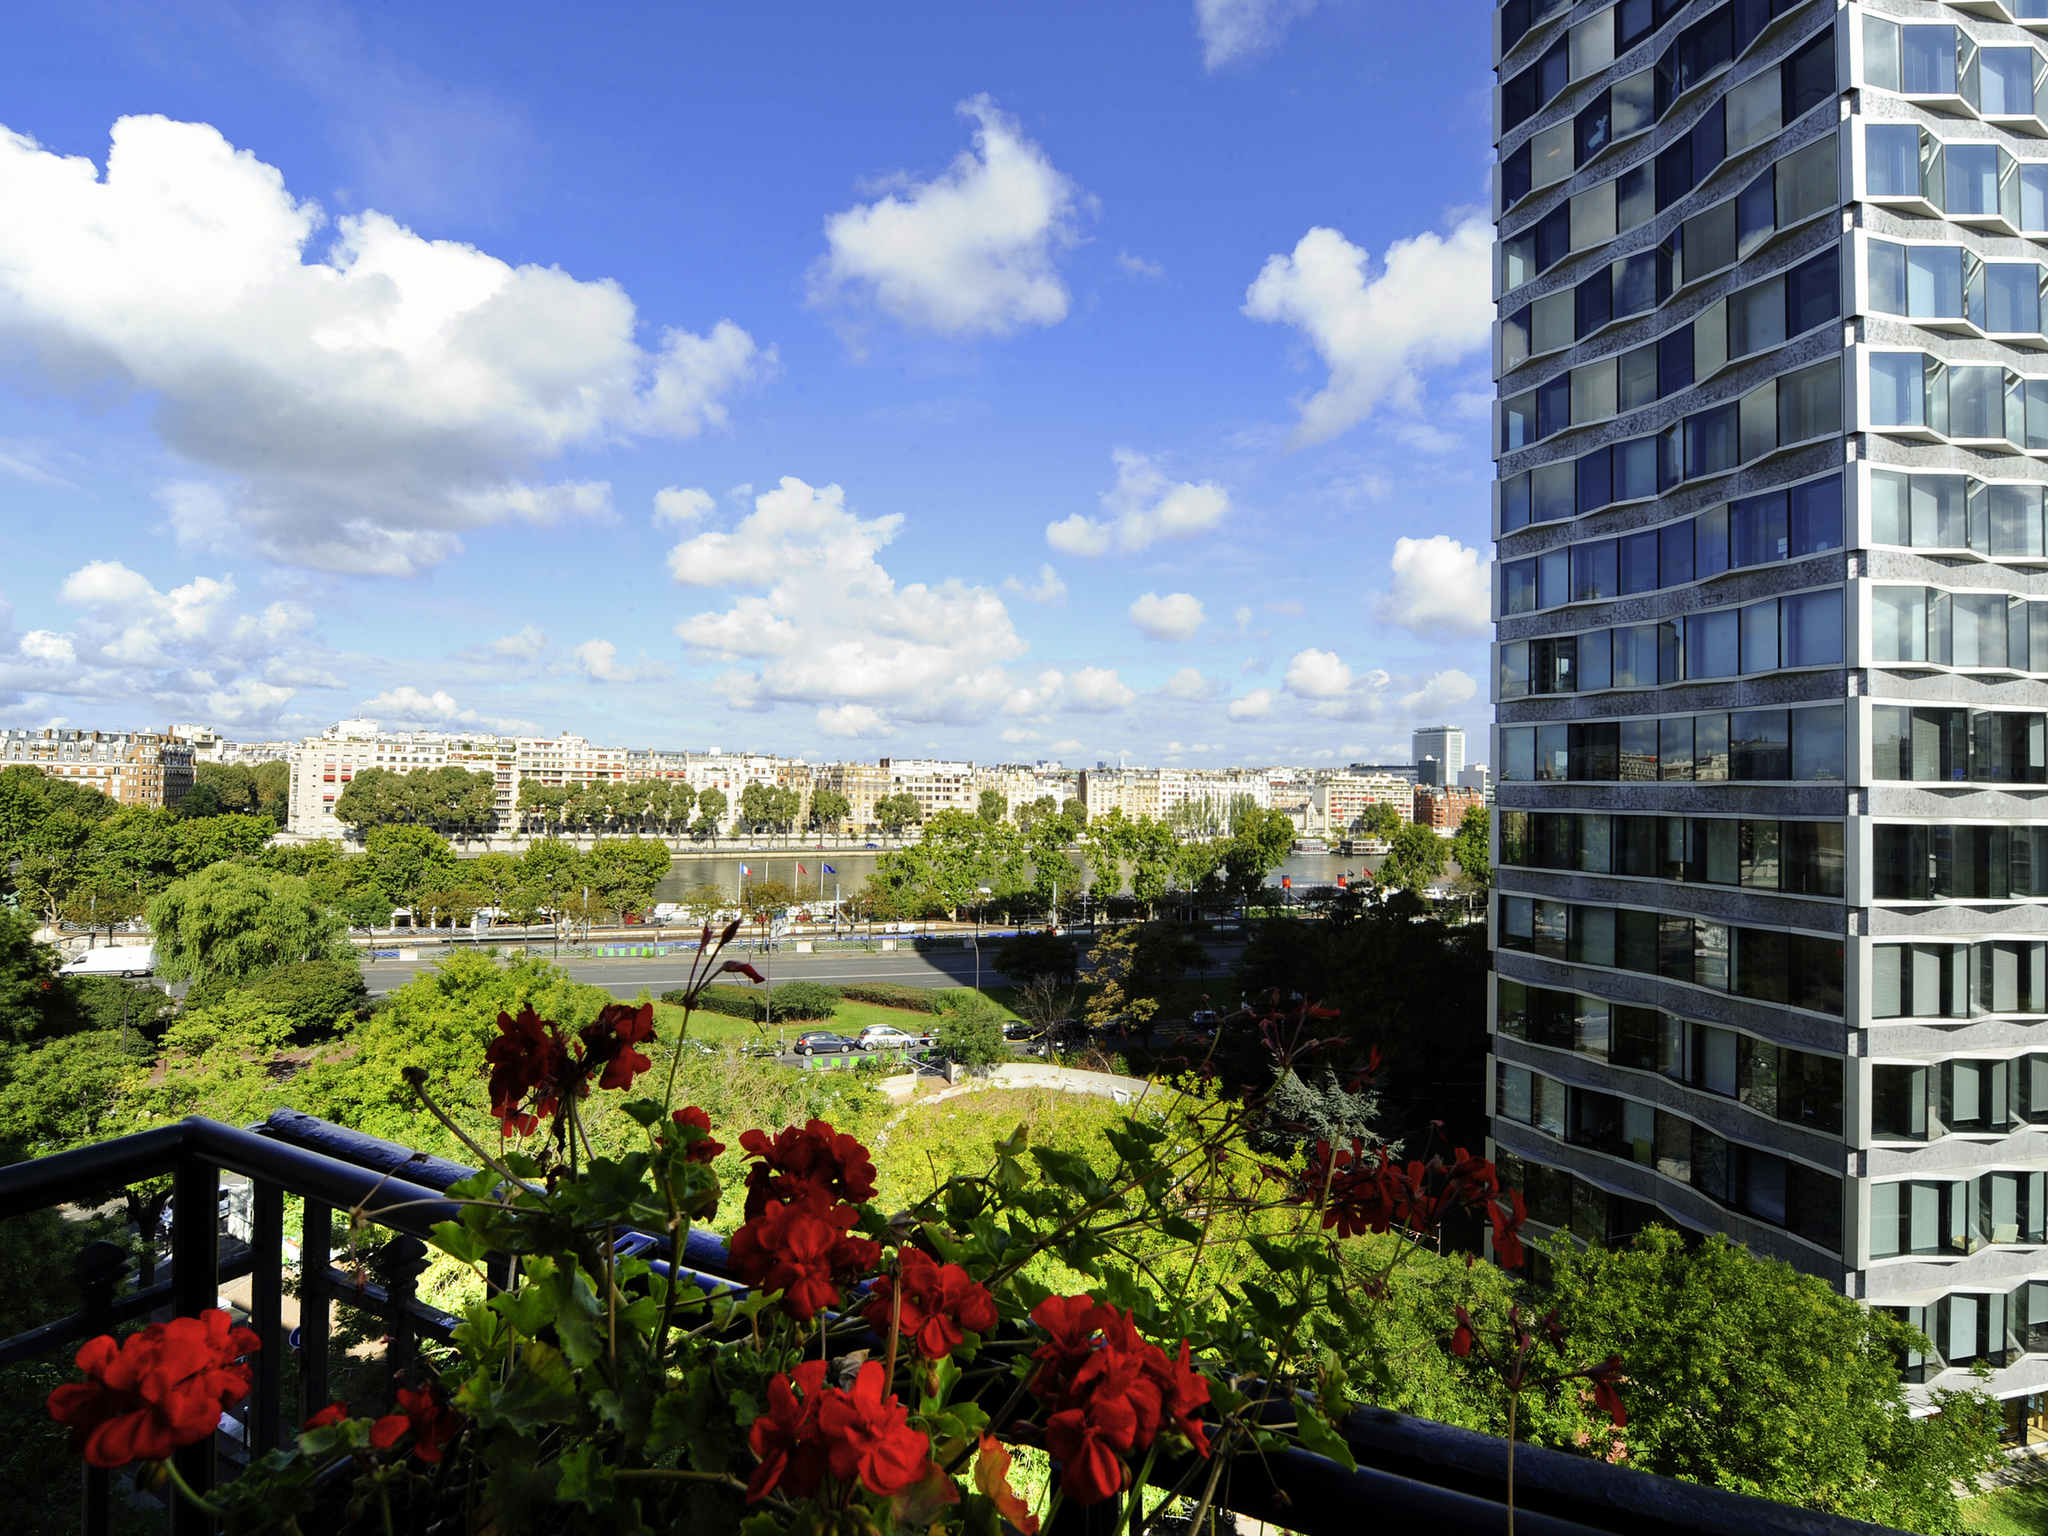 فندق - فندق مركيور Mercure باريس تور إيفل بون ميرابو